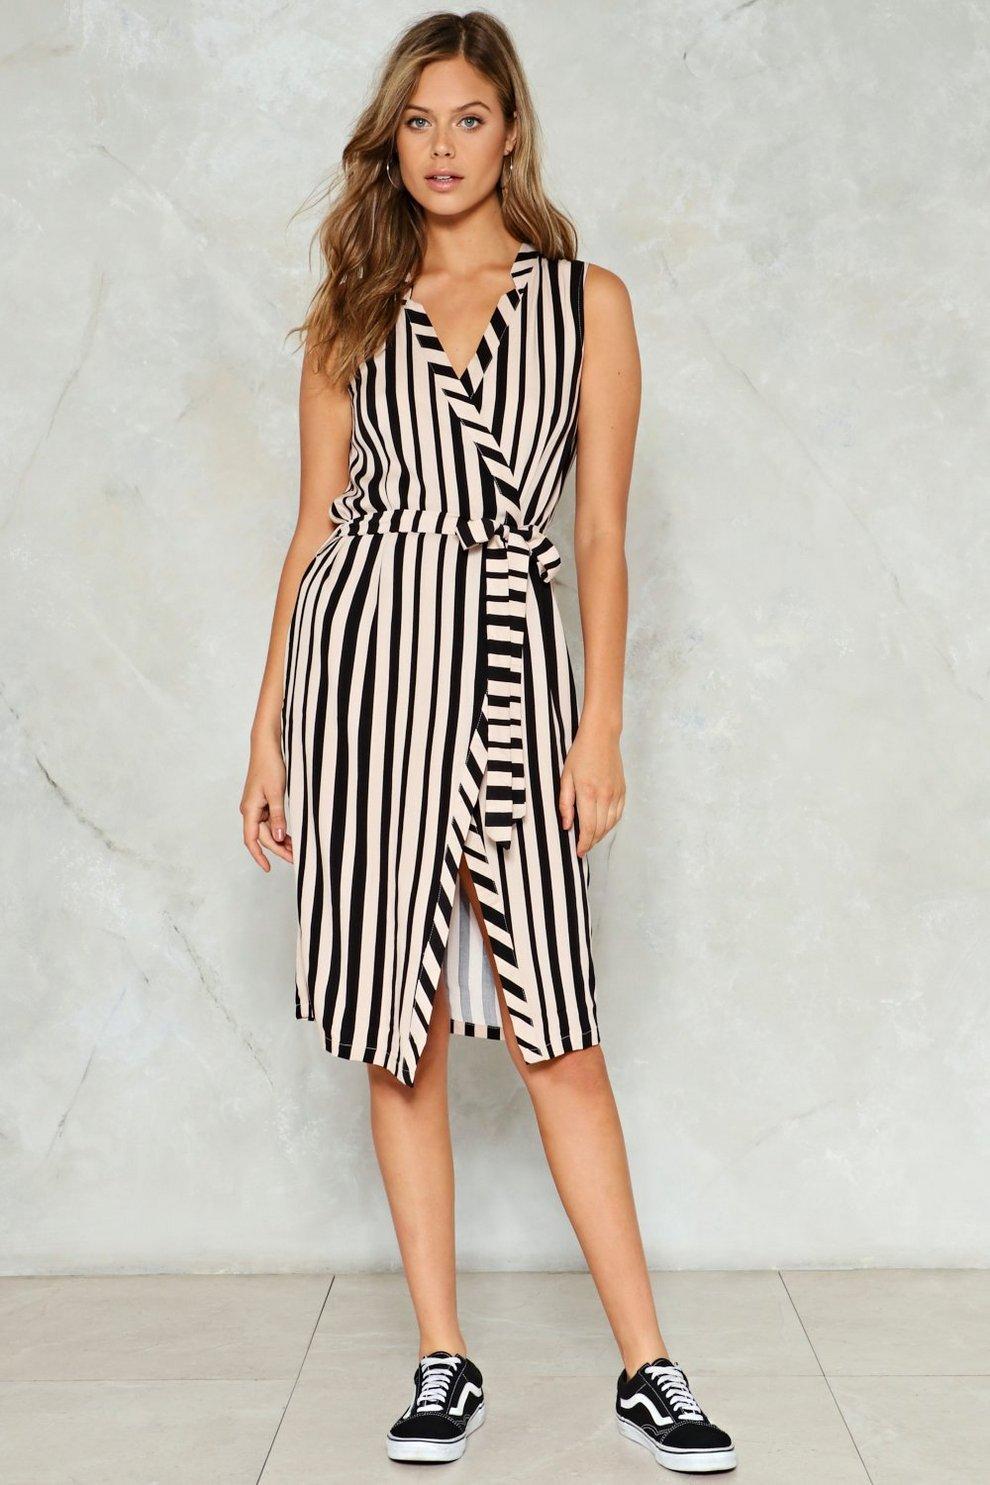 88b3364362b5 Think Straight Striped Dress